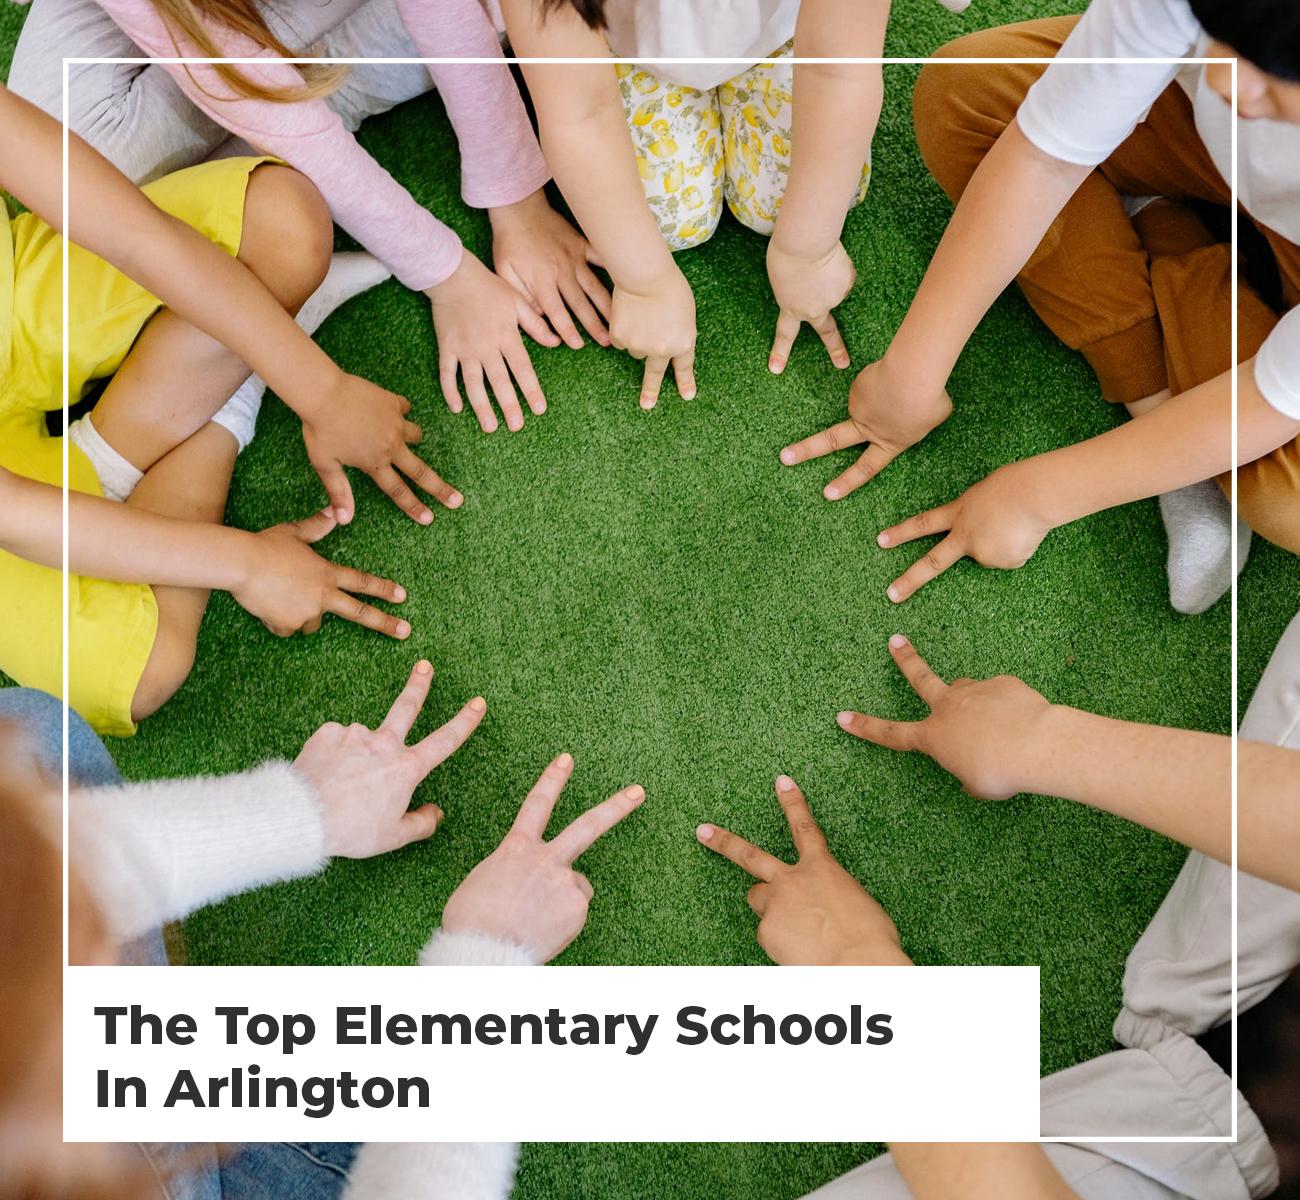 Top Elementary Schools in Arlington